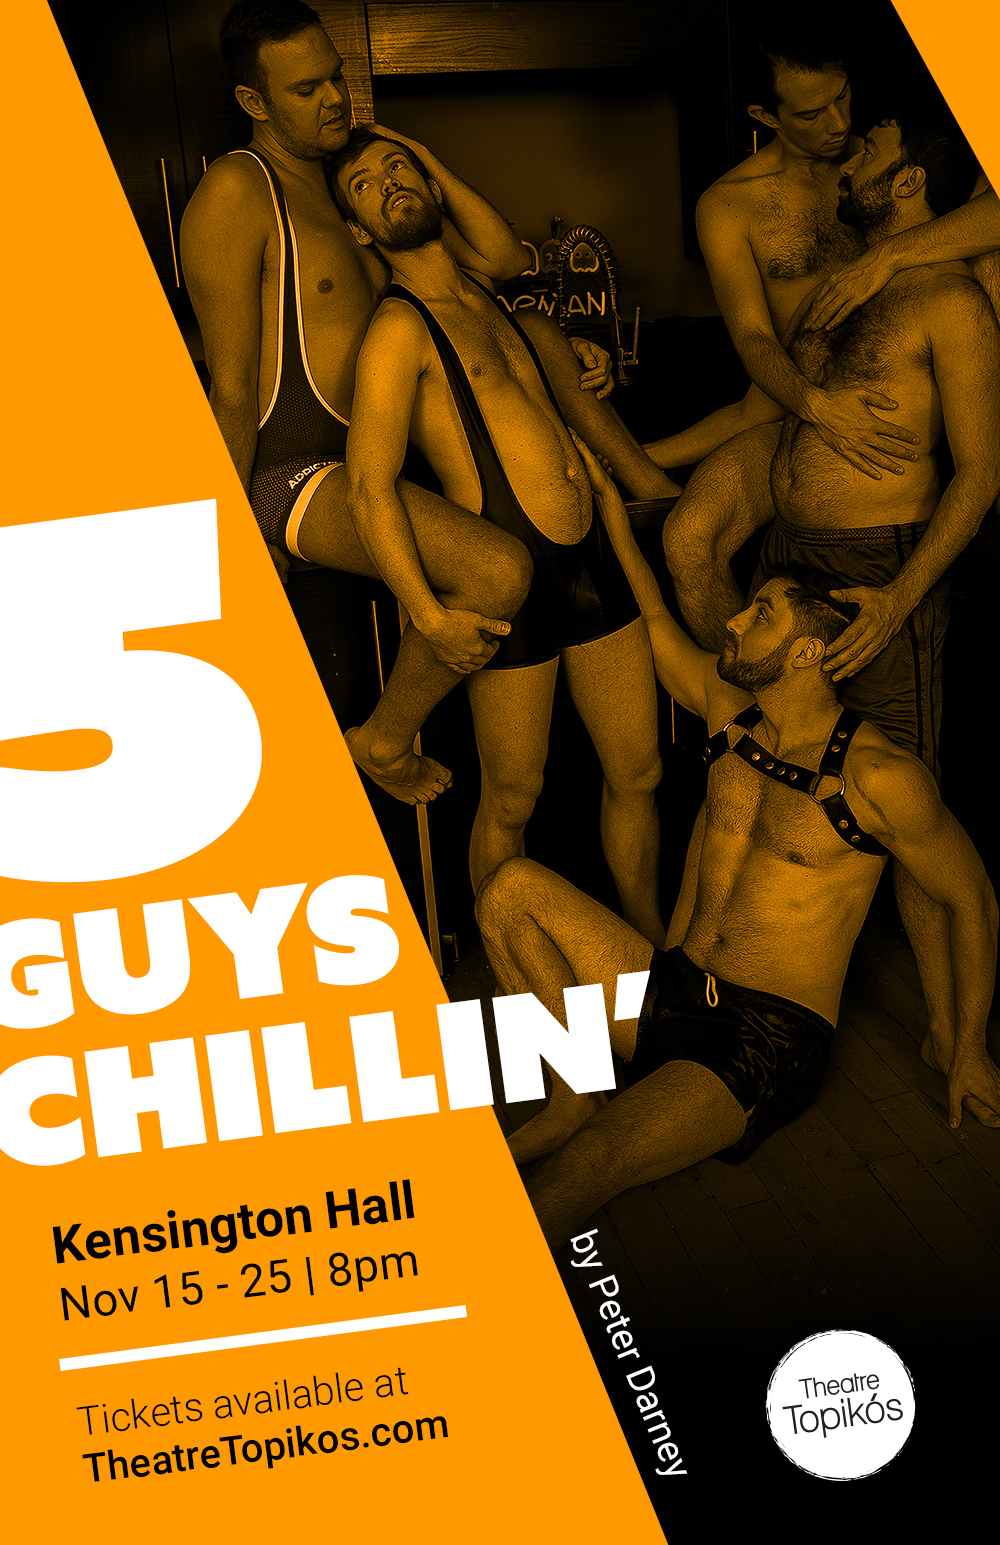 5 Guys Chillin' Poster Toronto